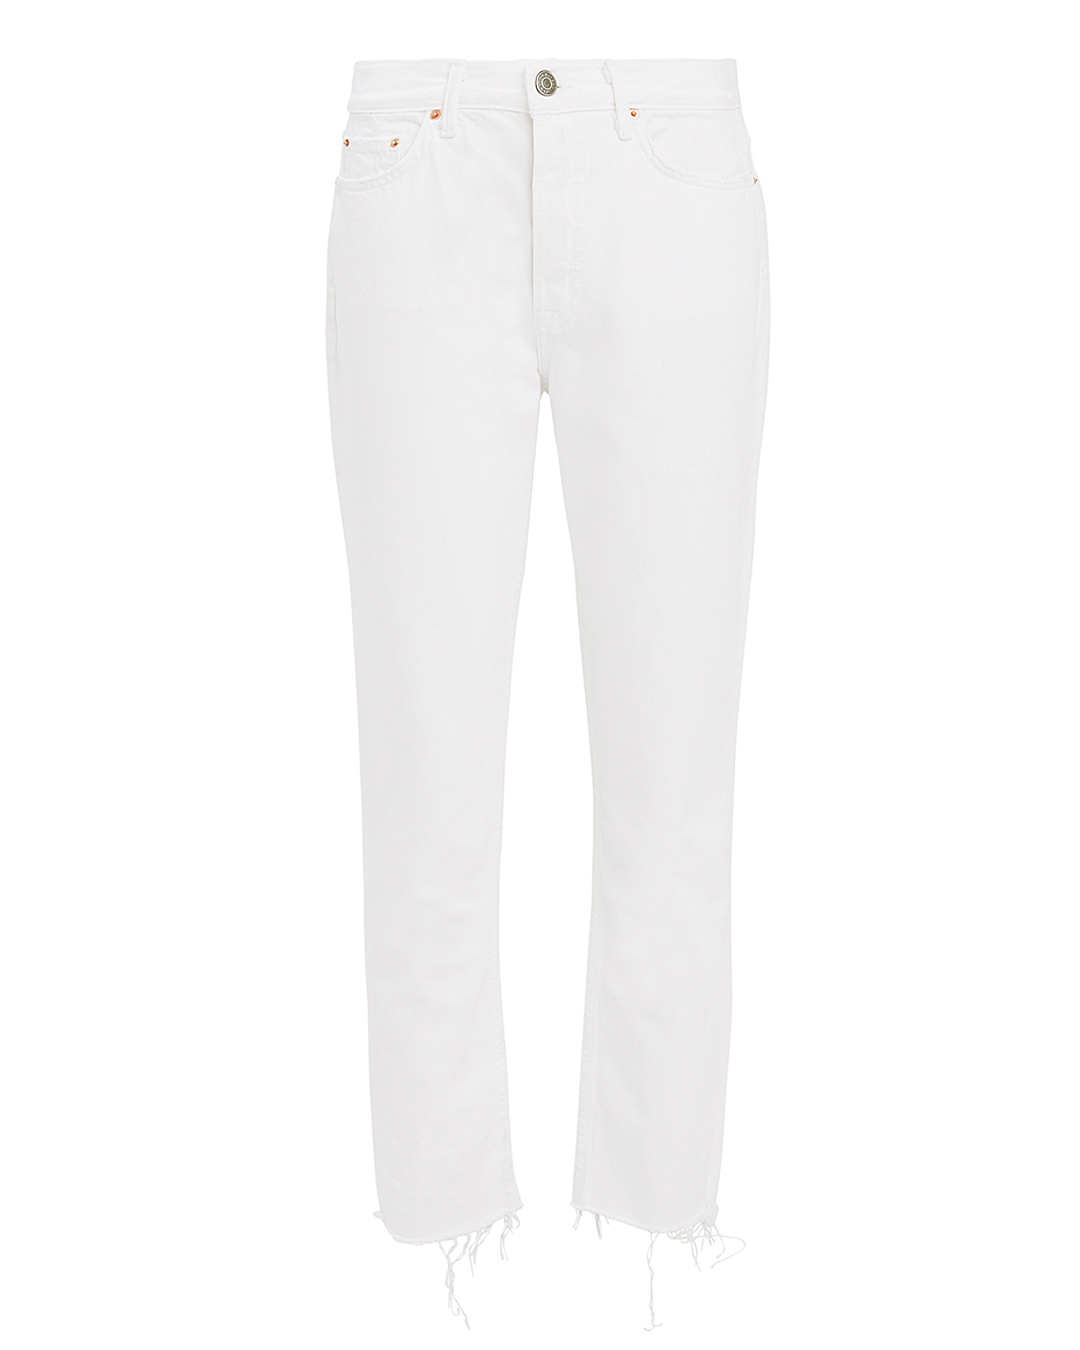 GRLFRND Karolina White Skinny Jeans